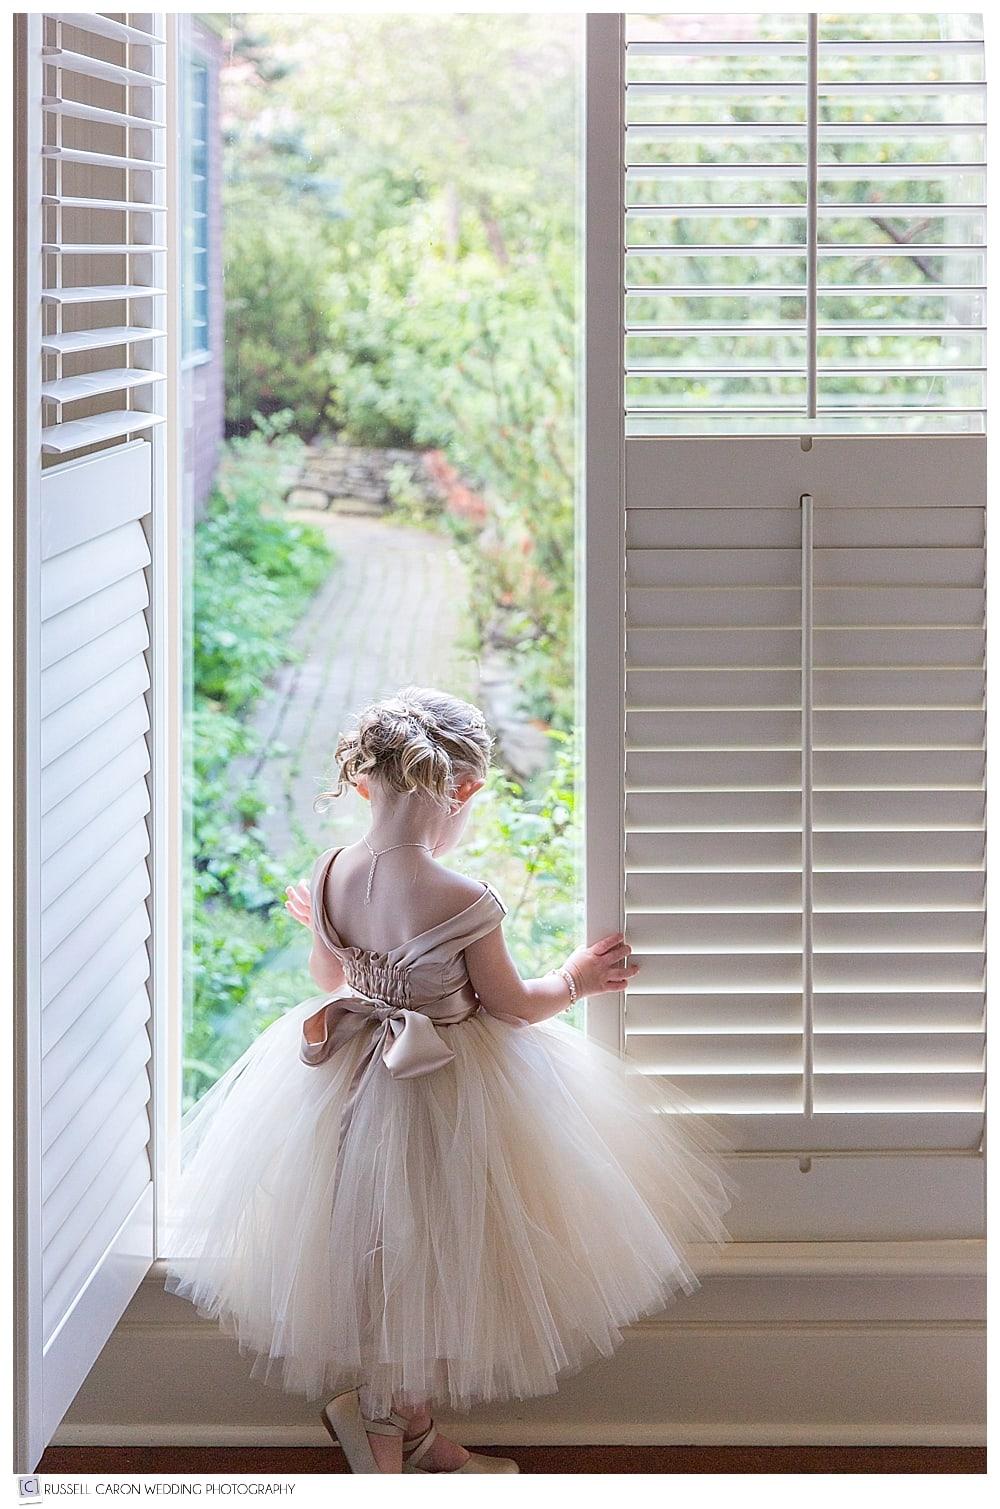 flower-girl-at-window